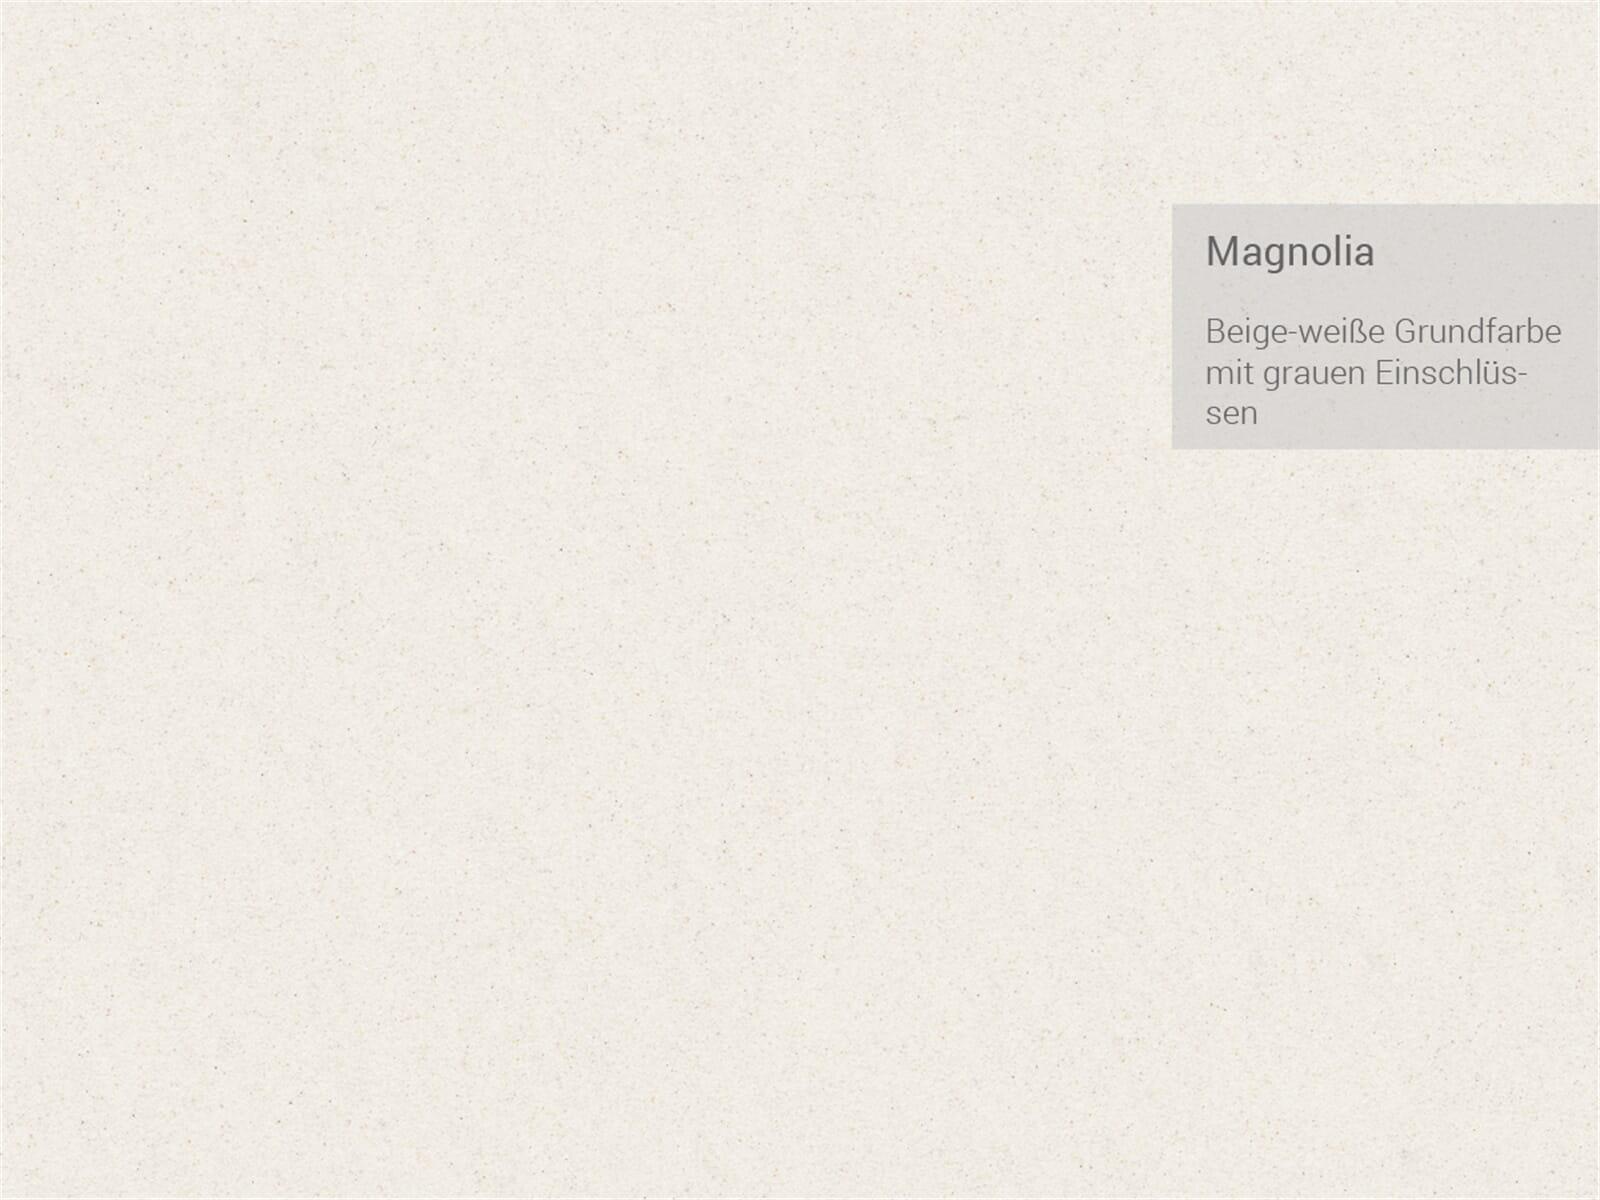 Franke Maris MRG 610-58 Magnolia Granitspüle